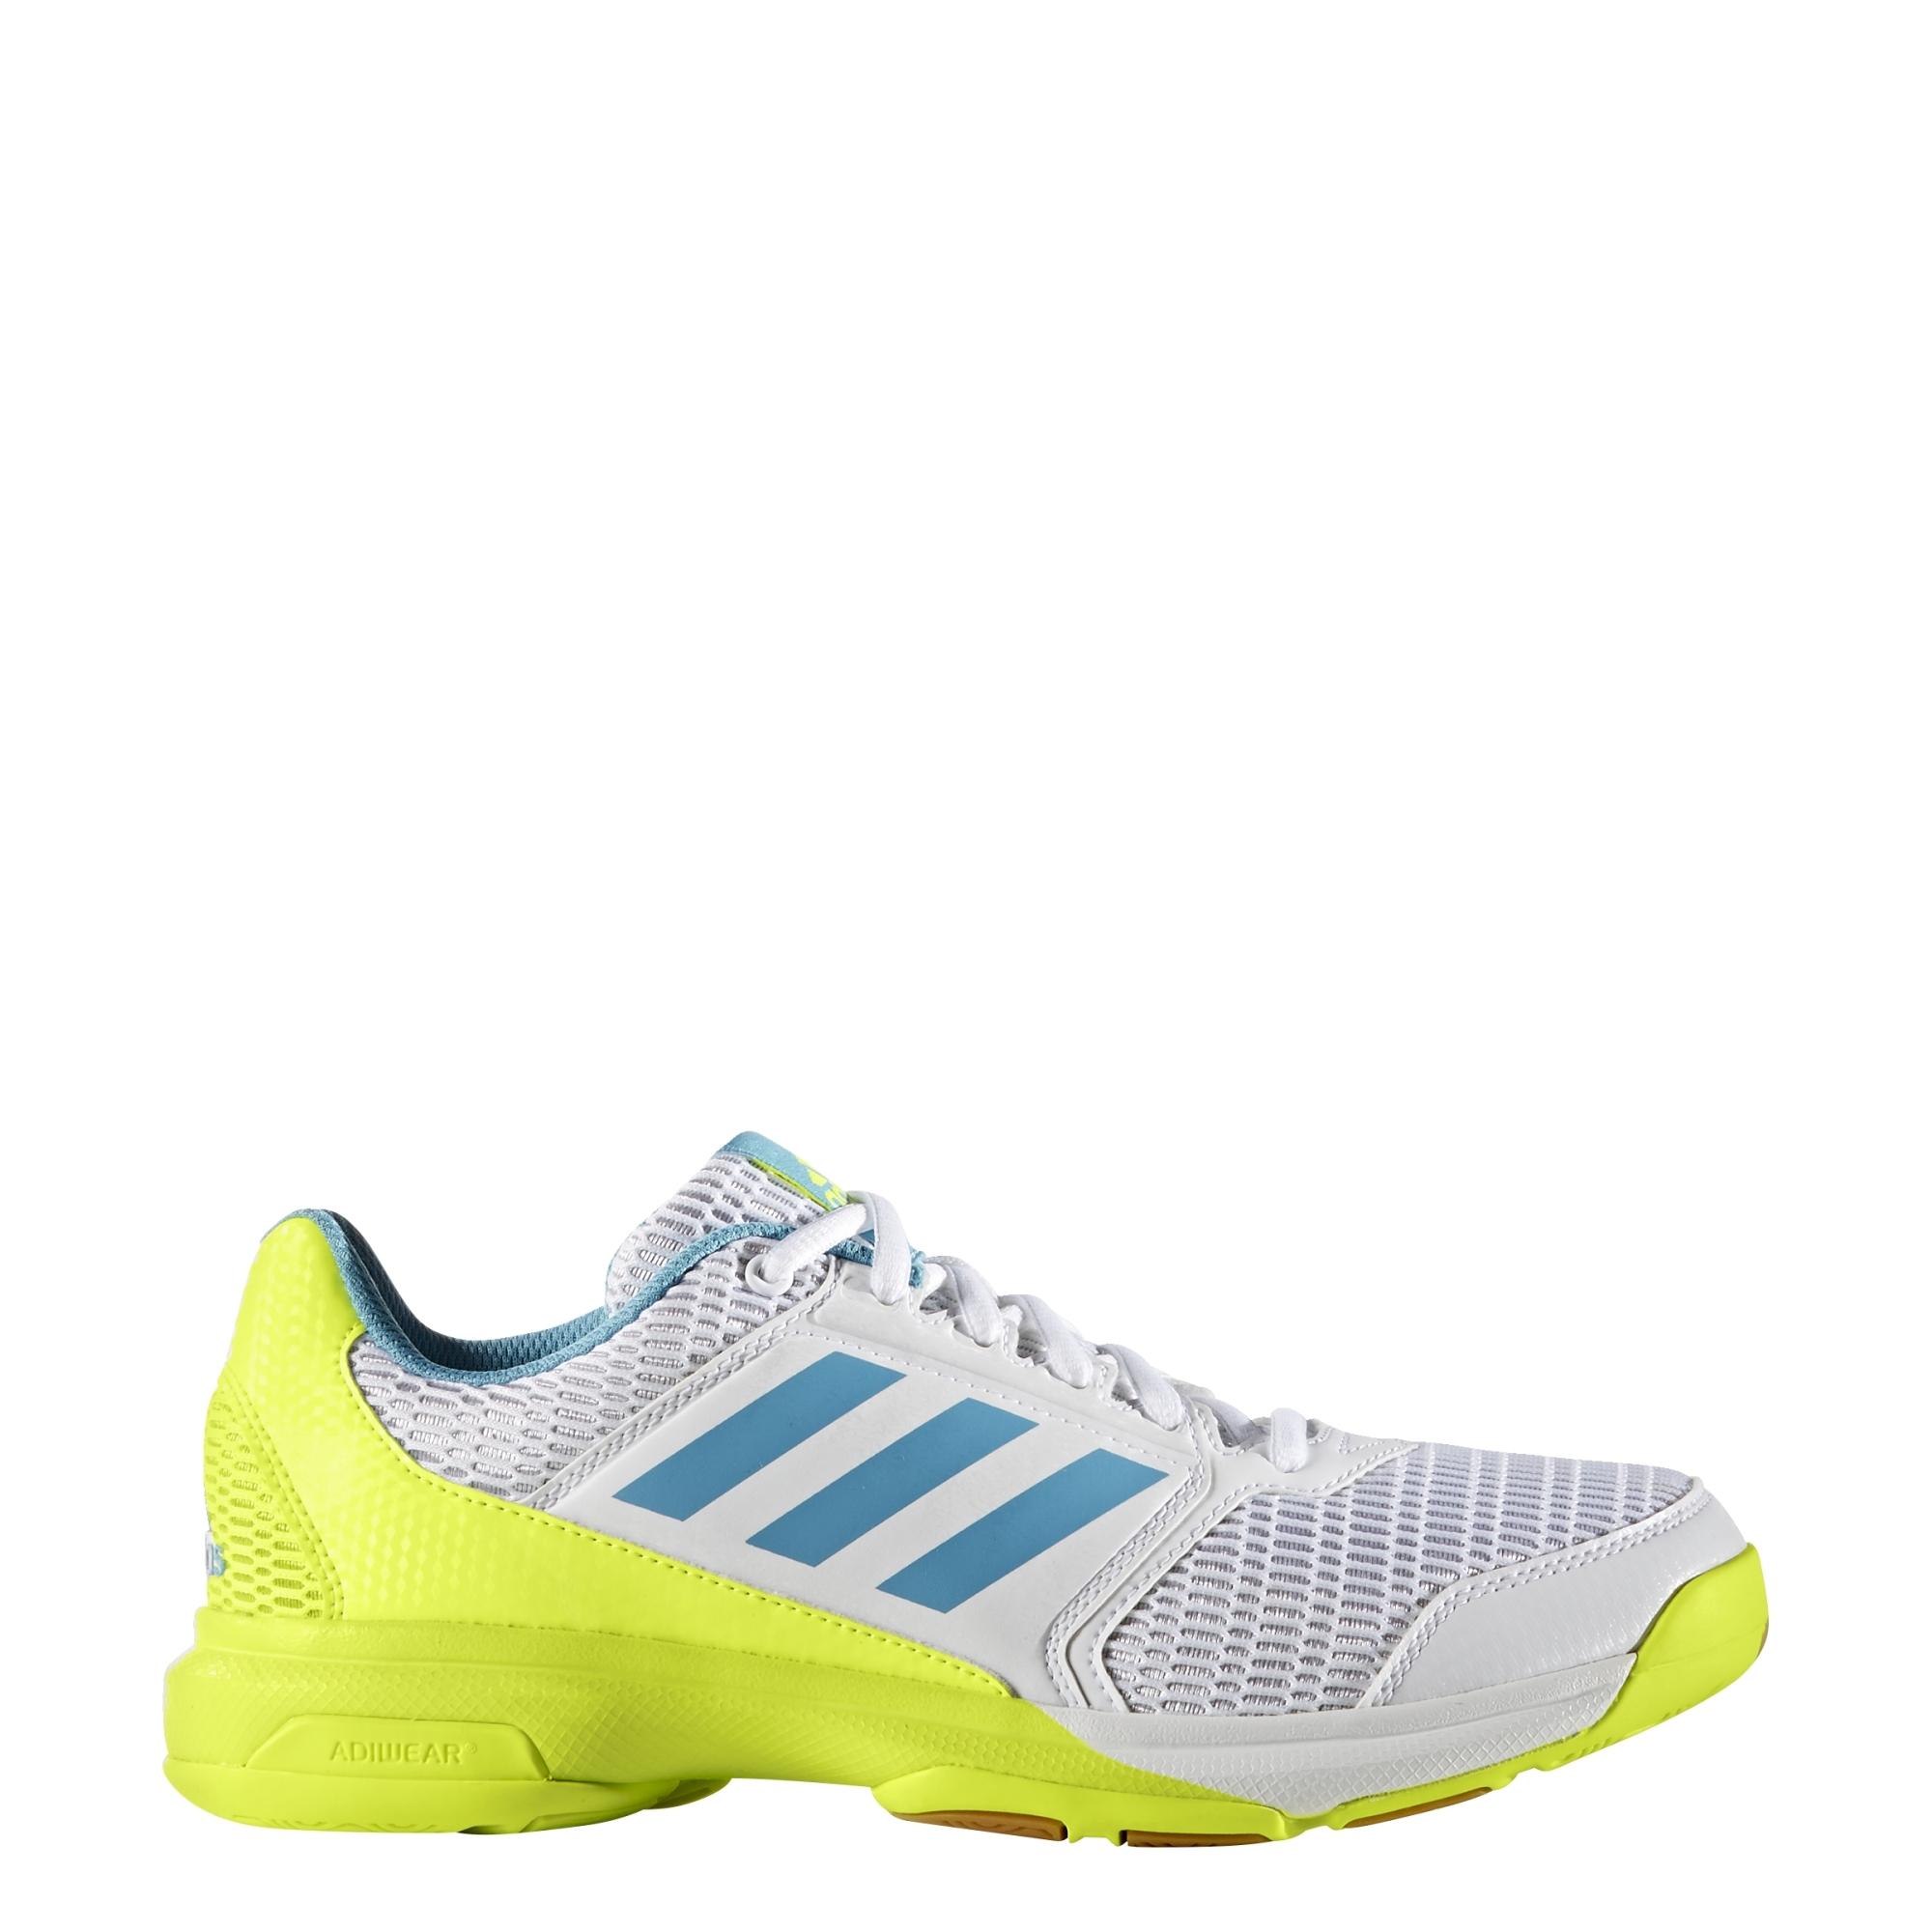 sports shoes 8087a bf513 adidas Multido Essence Shoes W AQ6287